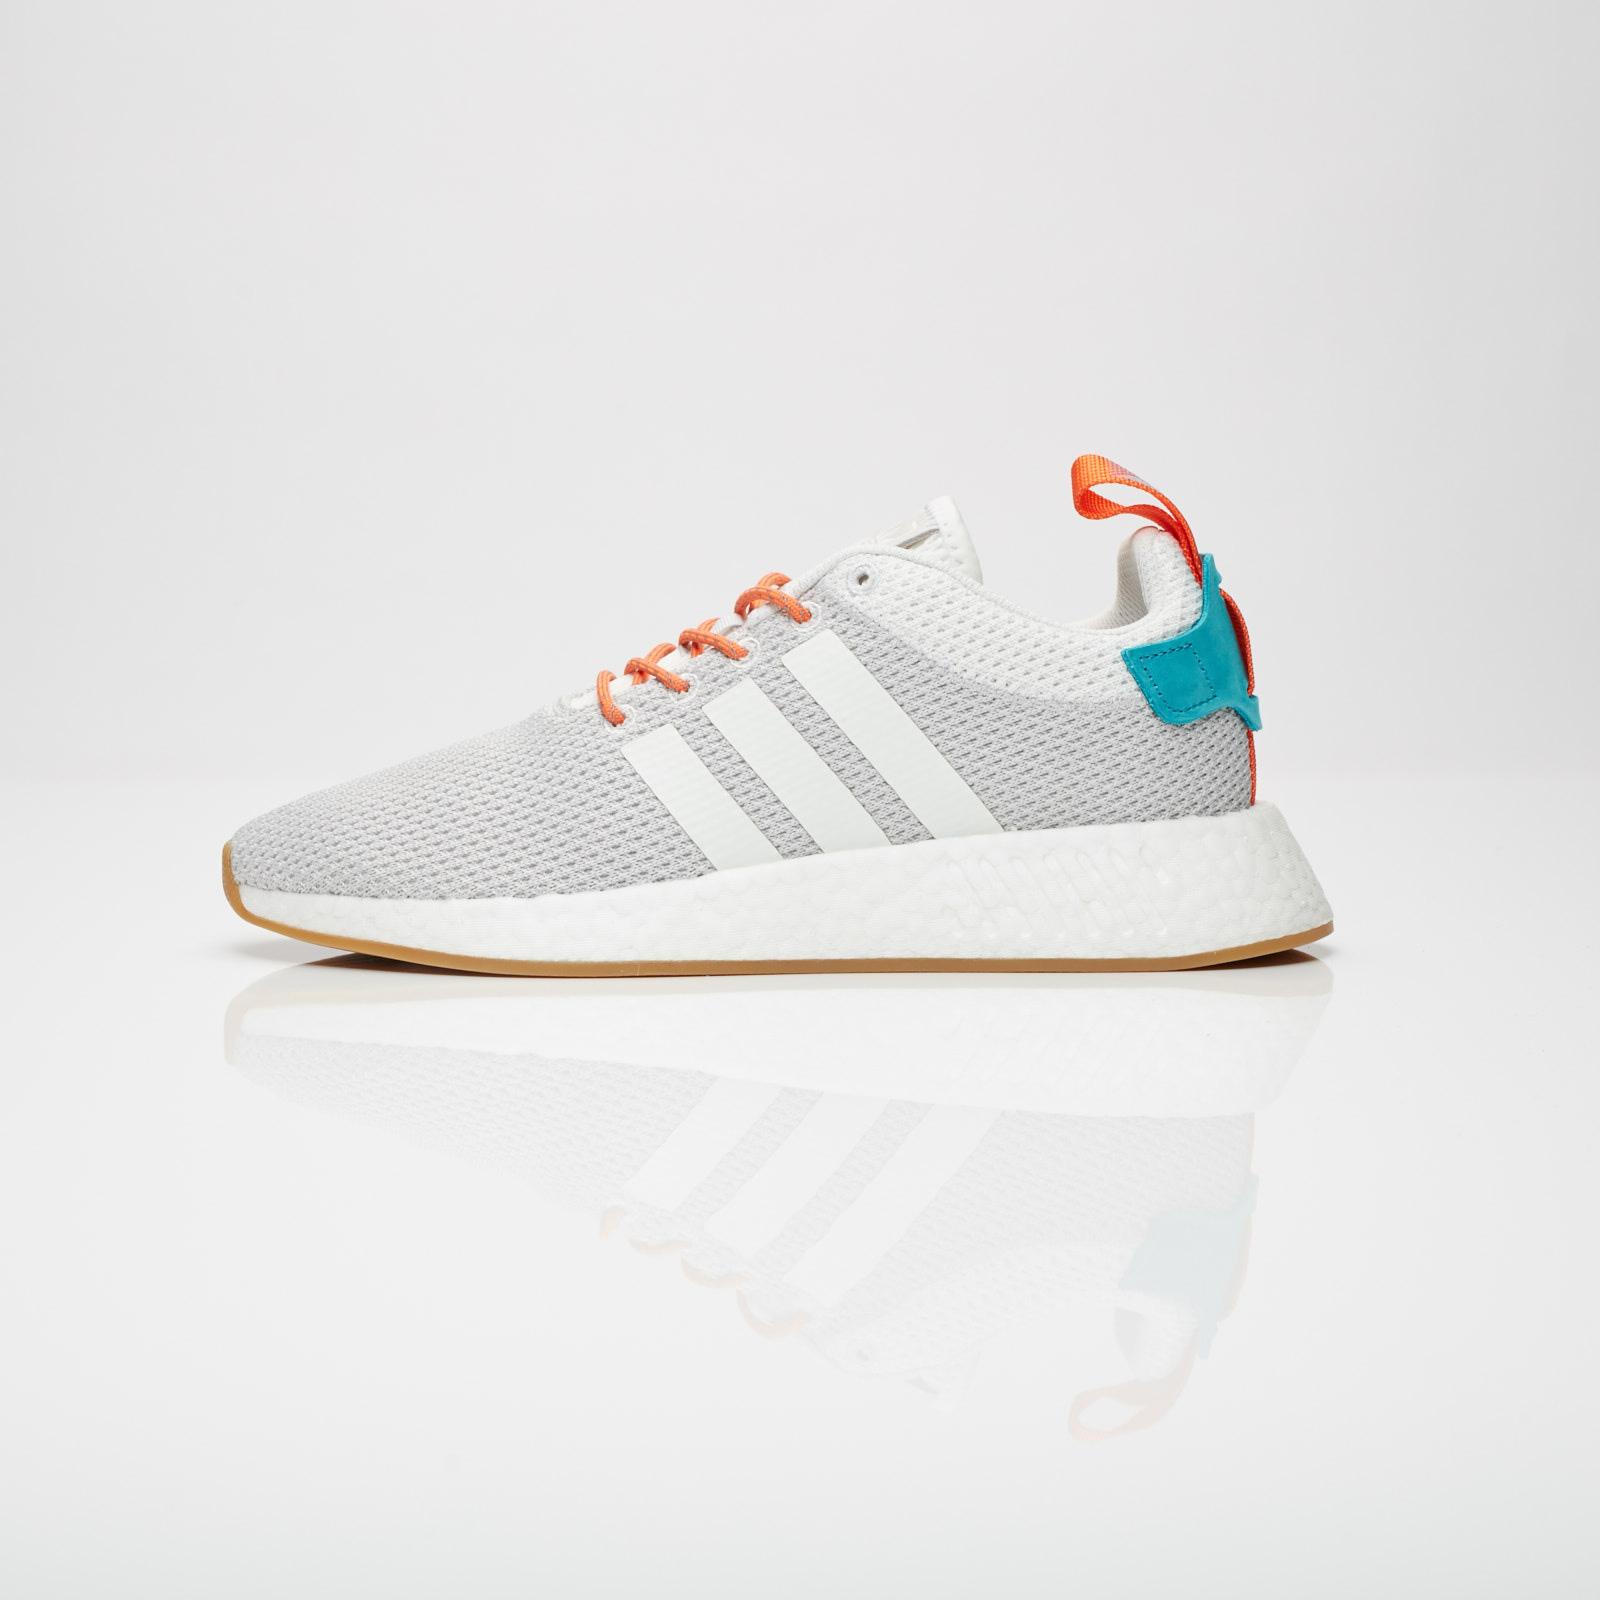 fd4b0285b0cfb adidas NMD R2 Summer - Cq3080 - Sneakersnstuff